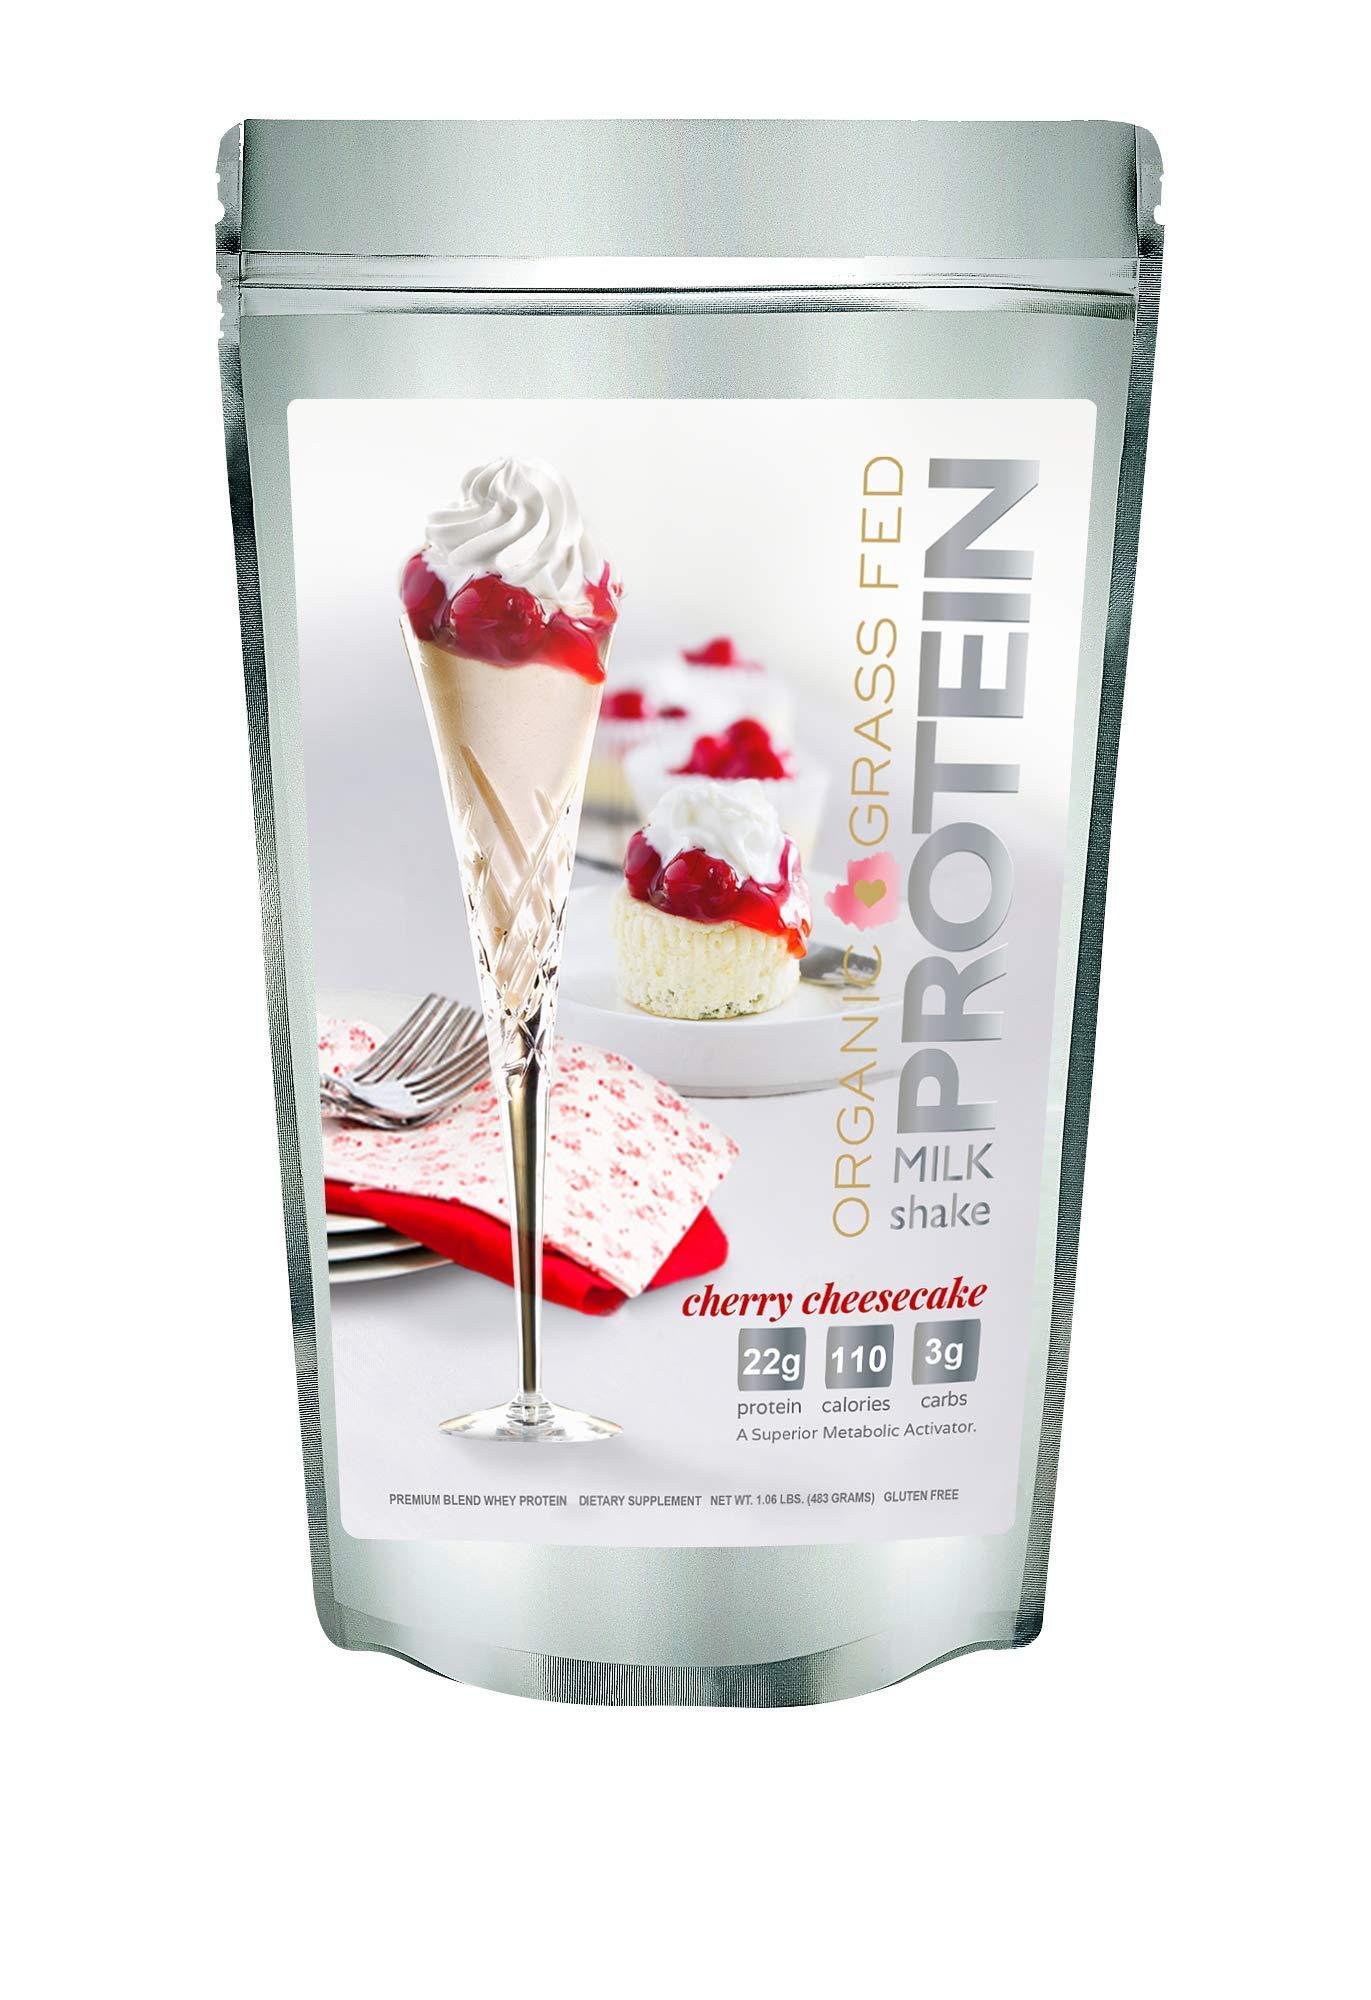 Protein Milkshake Whey Master Parent (15 Servings, Cherry Cheesecake) by Protein Milkshake